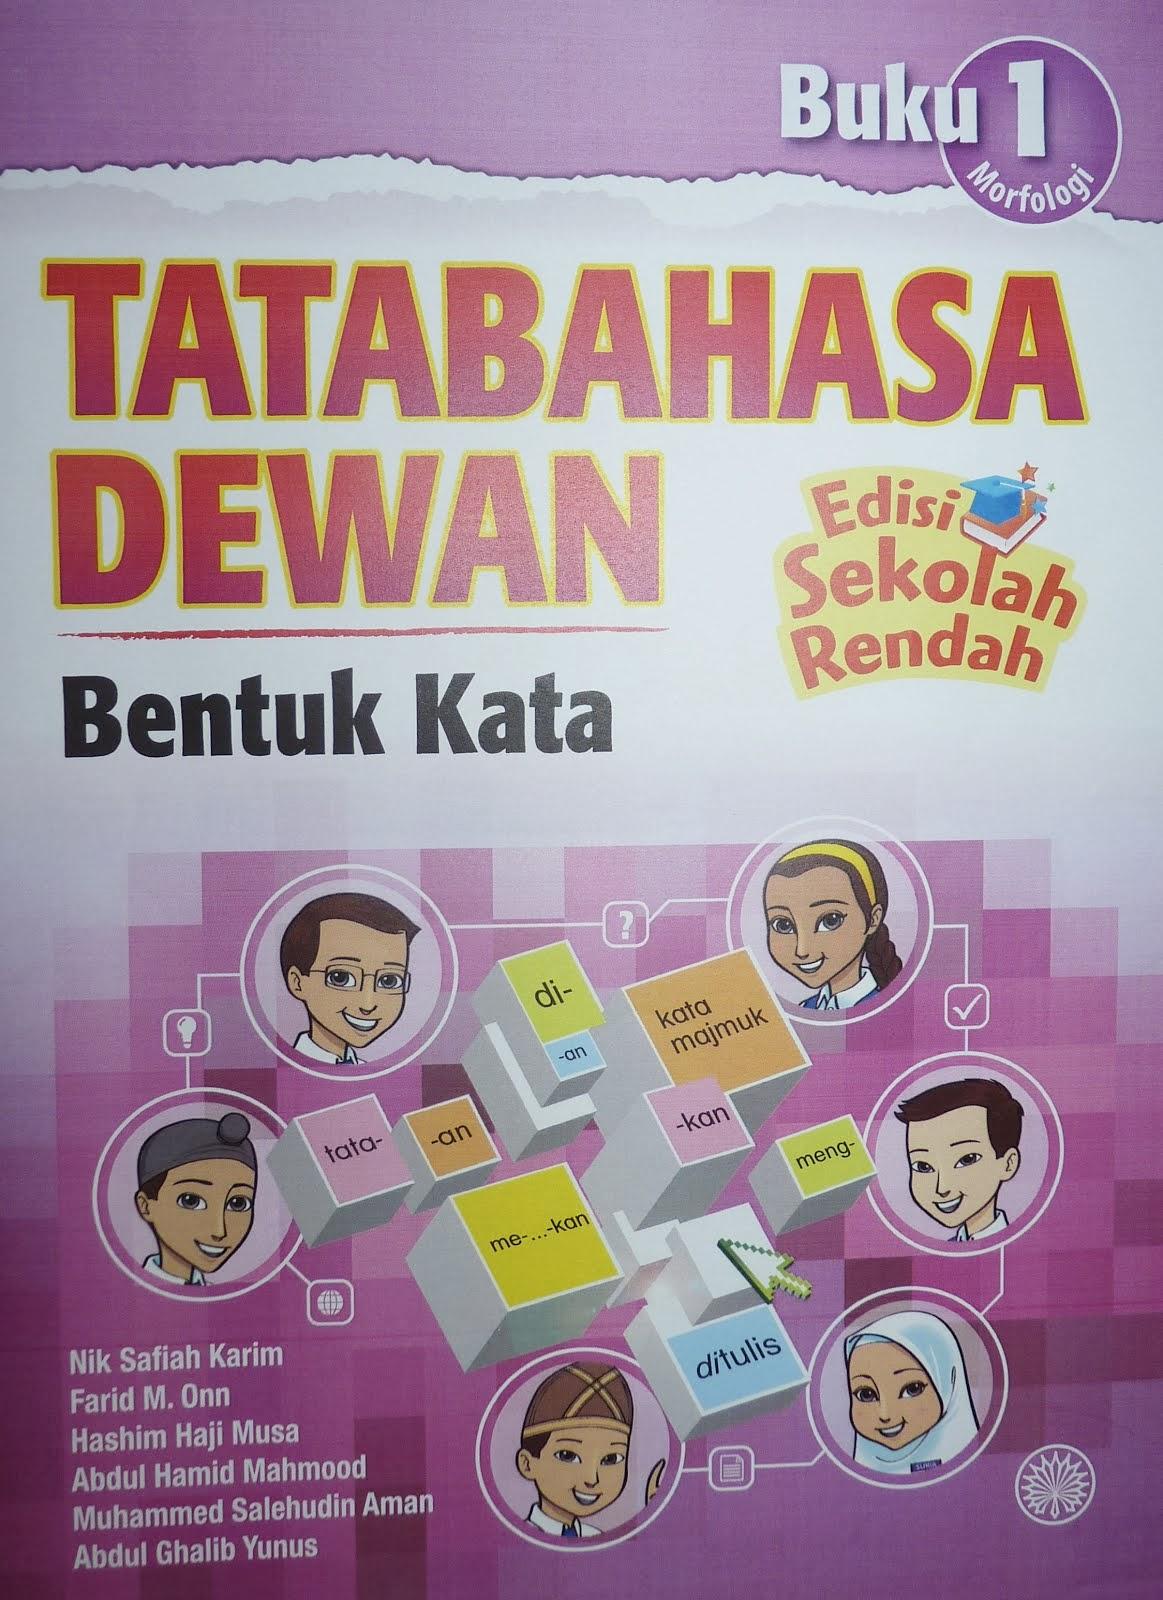 Buku Tatabahasa Dewan (Buku 1)-Bentuk Kata